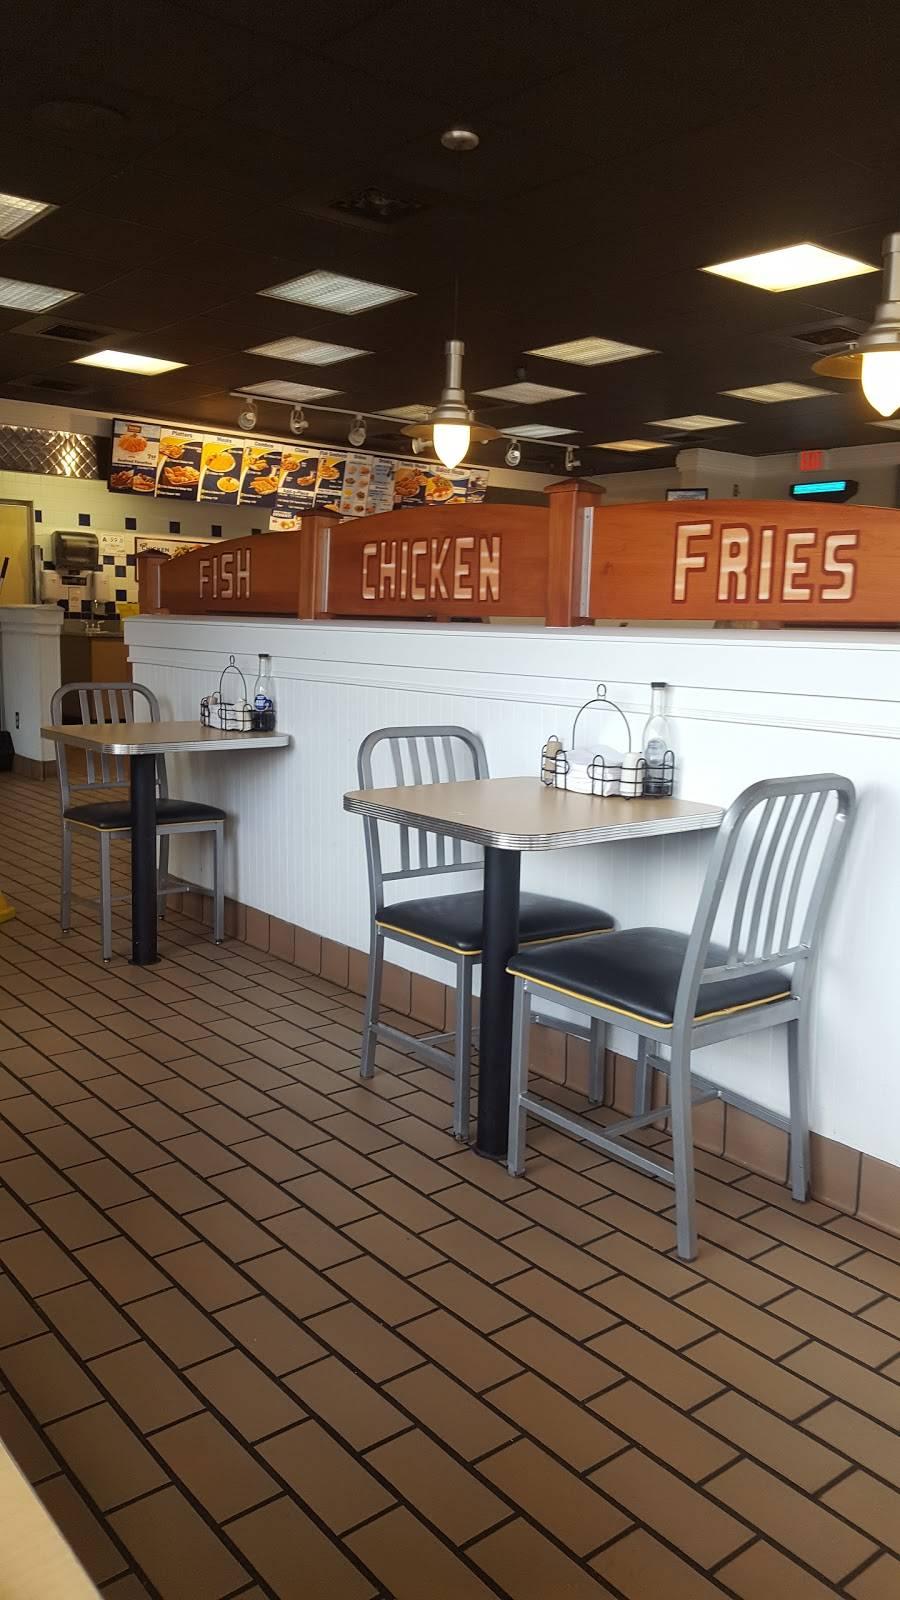 Long John Silvers | restaurant | 800 Brevard Rd, Asheville, NC 28806, USA | 8286651605 OR +1 828-665-1605